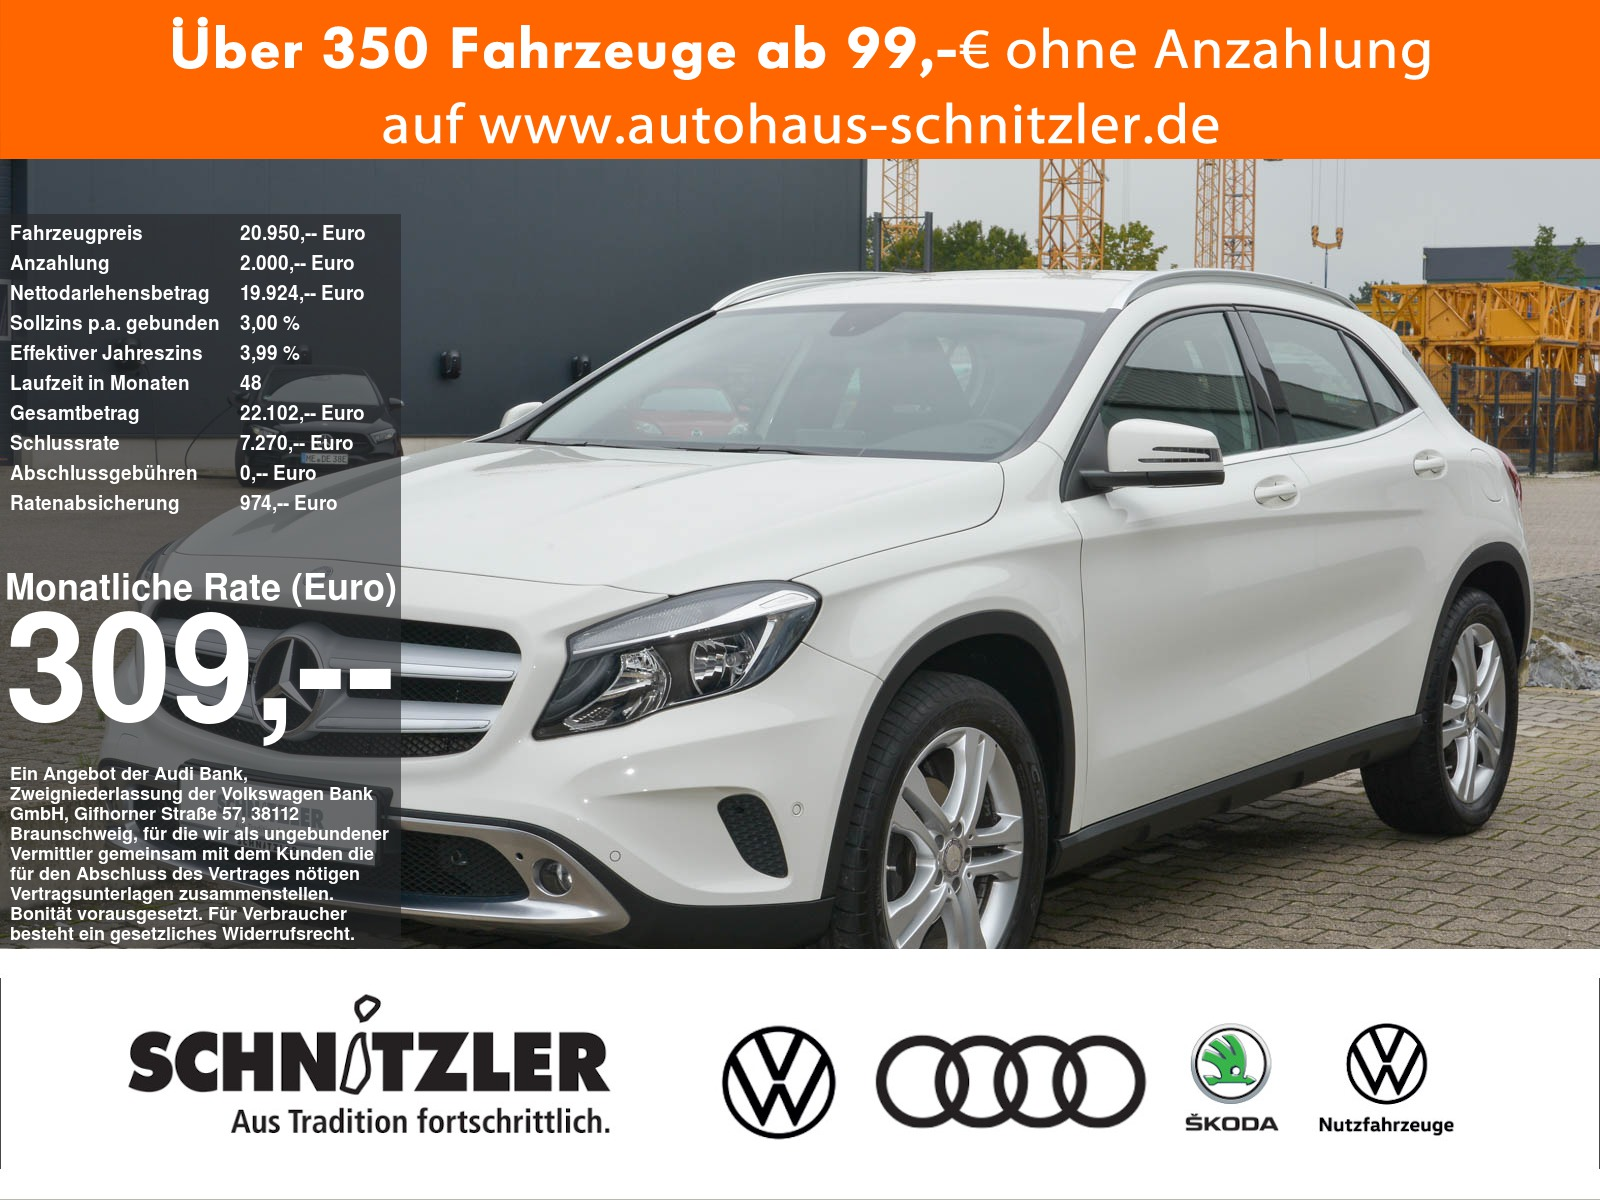 Mercedes-Benz GLA 200 Urban Automatik TEMP/NAVI/EPH/+++, Jahr 2015, Benzin